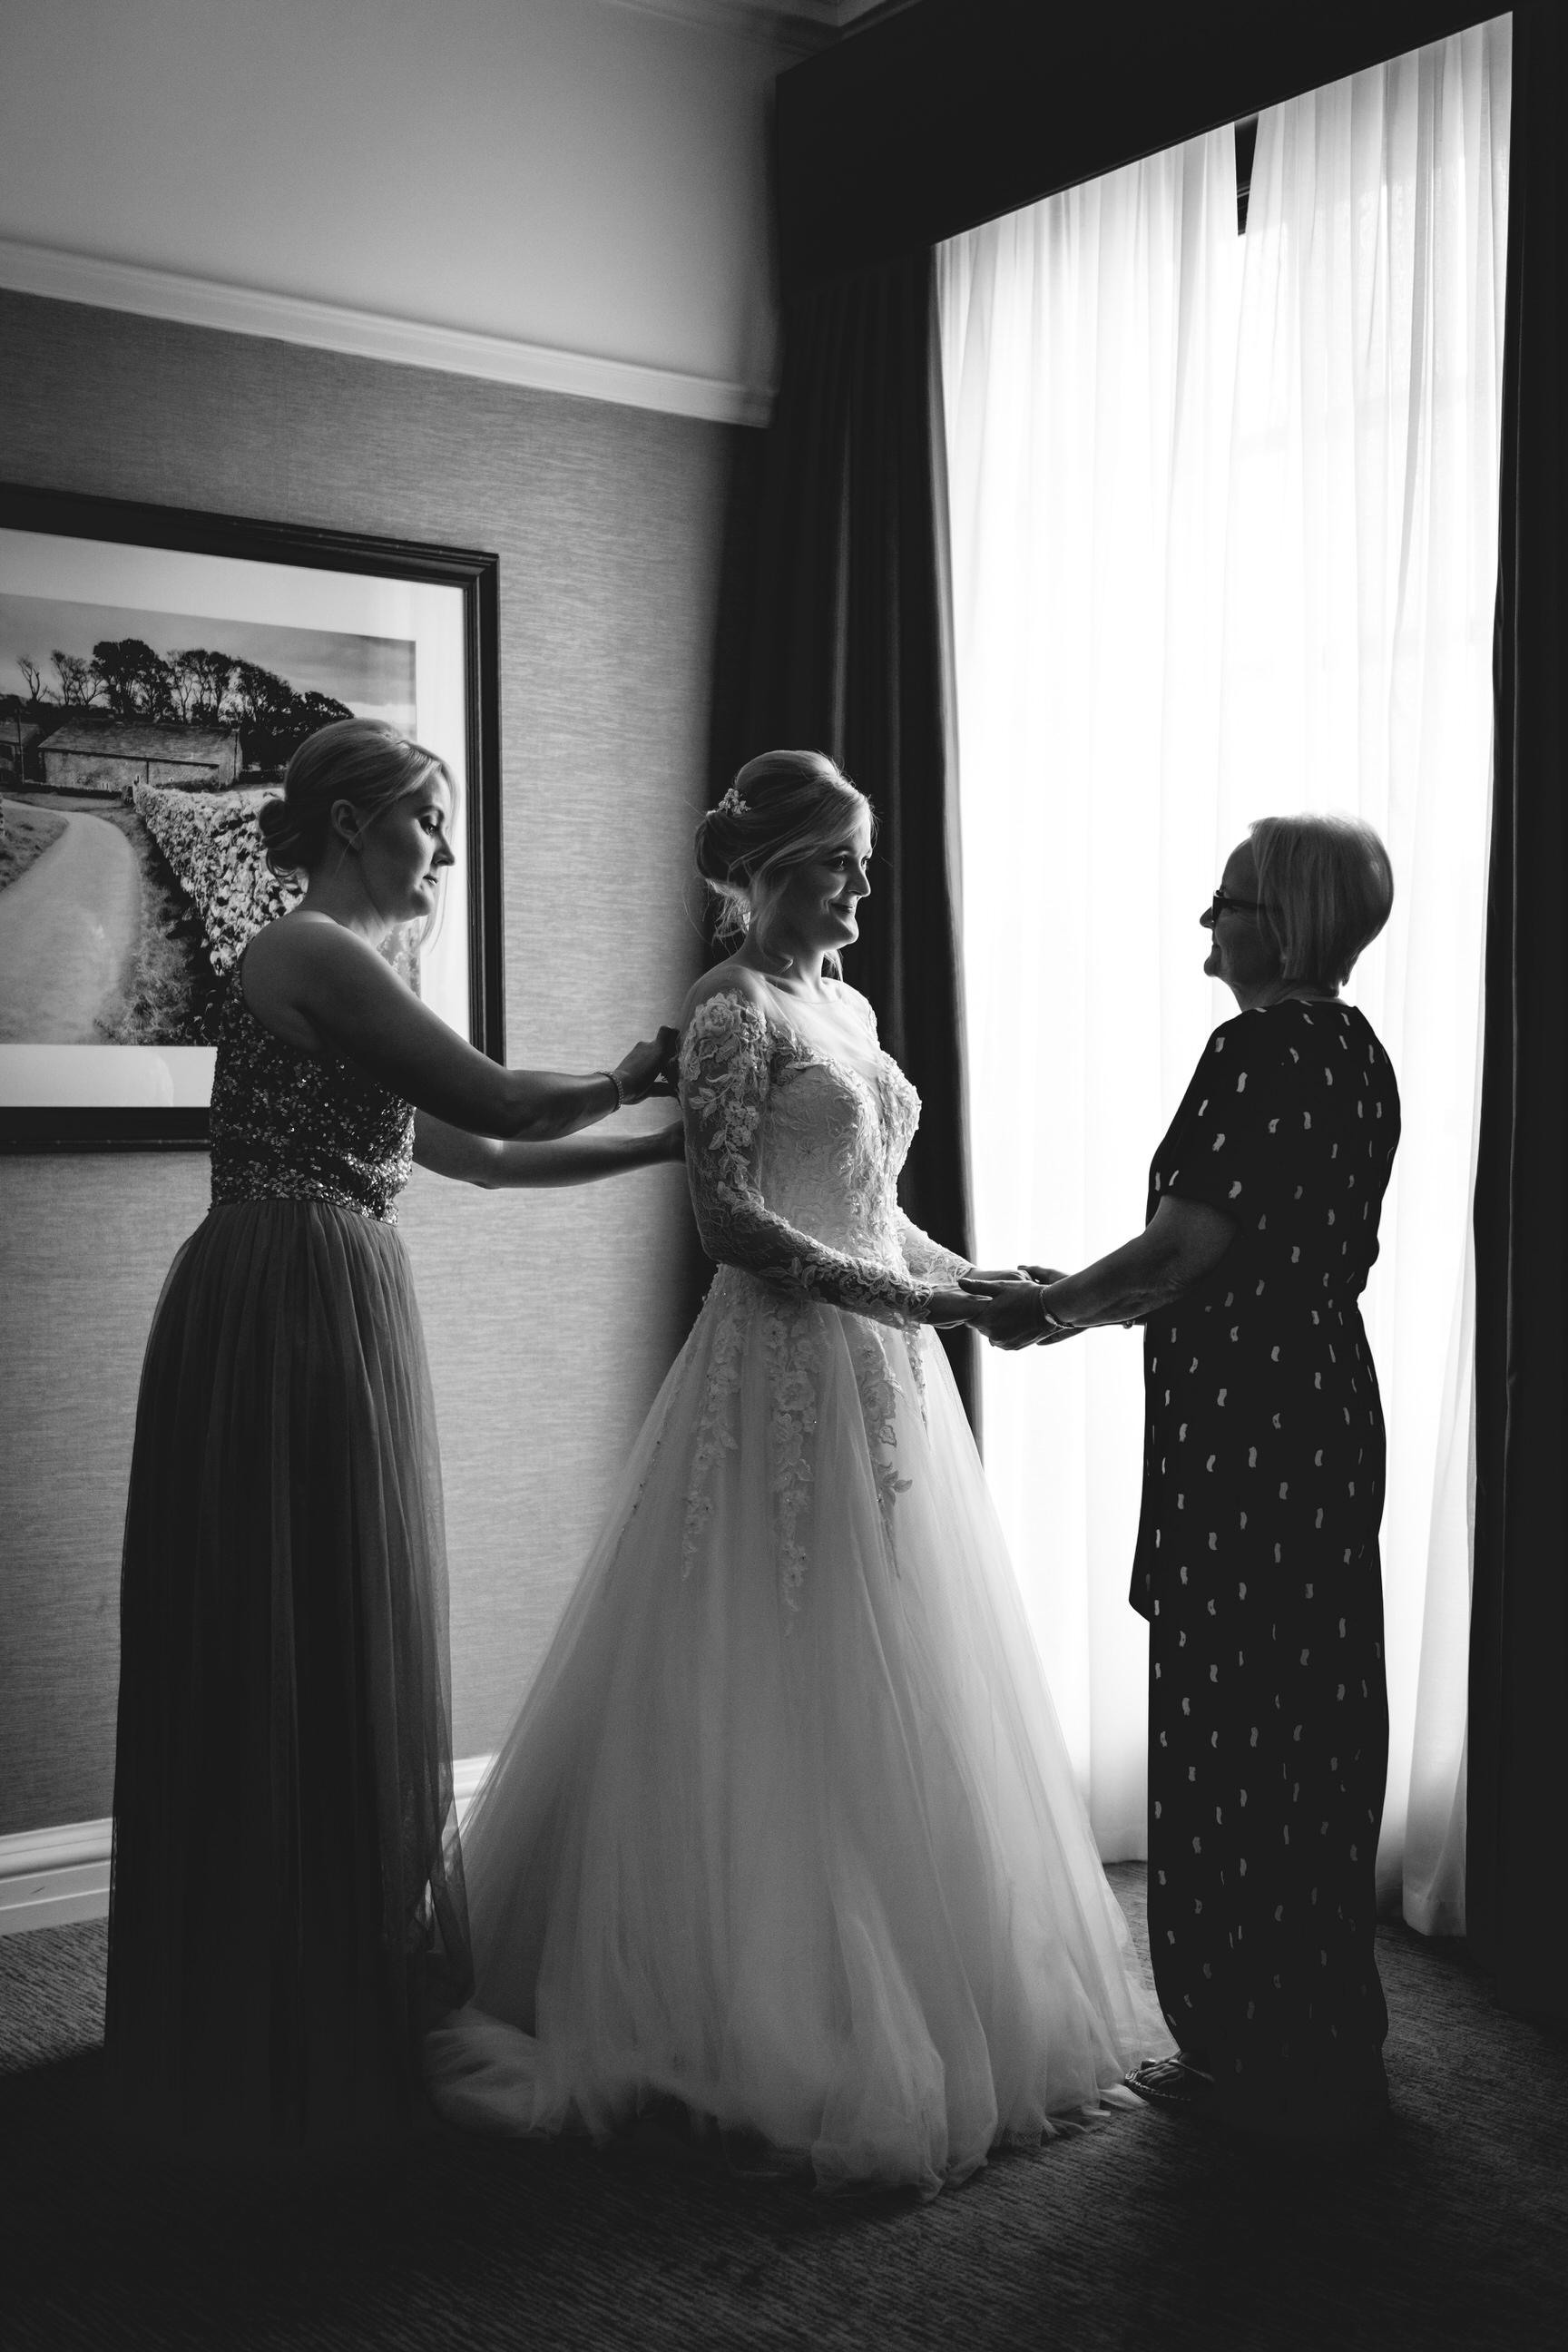 The-Grand-Hotel-York-wedding-photographer-2.jpg